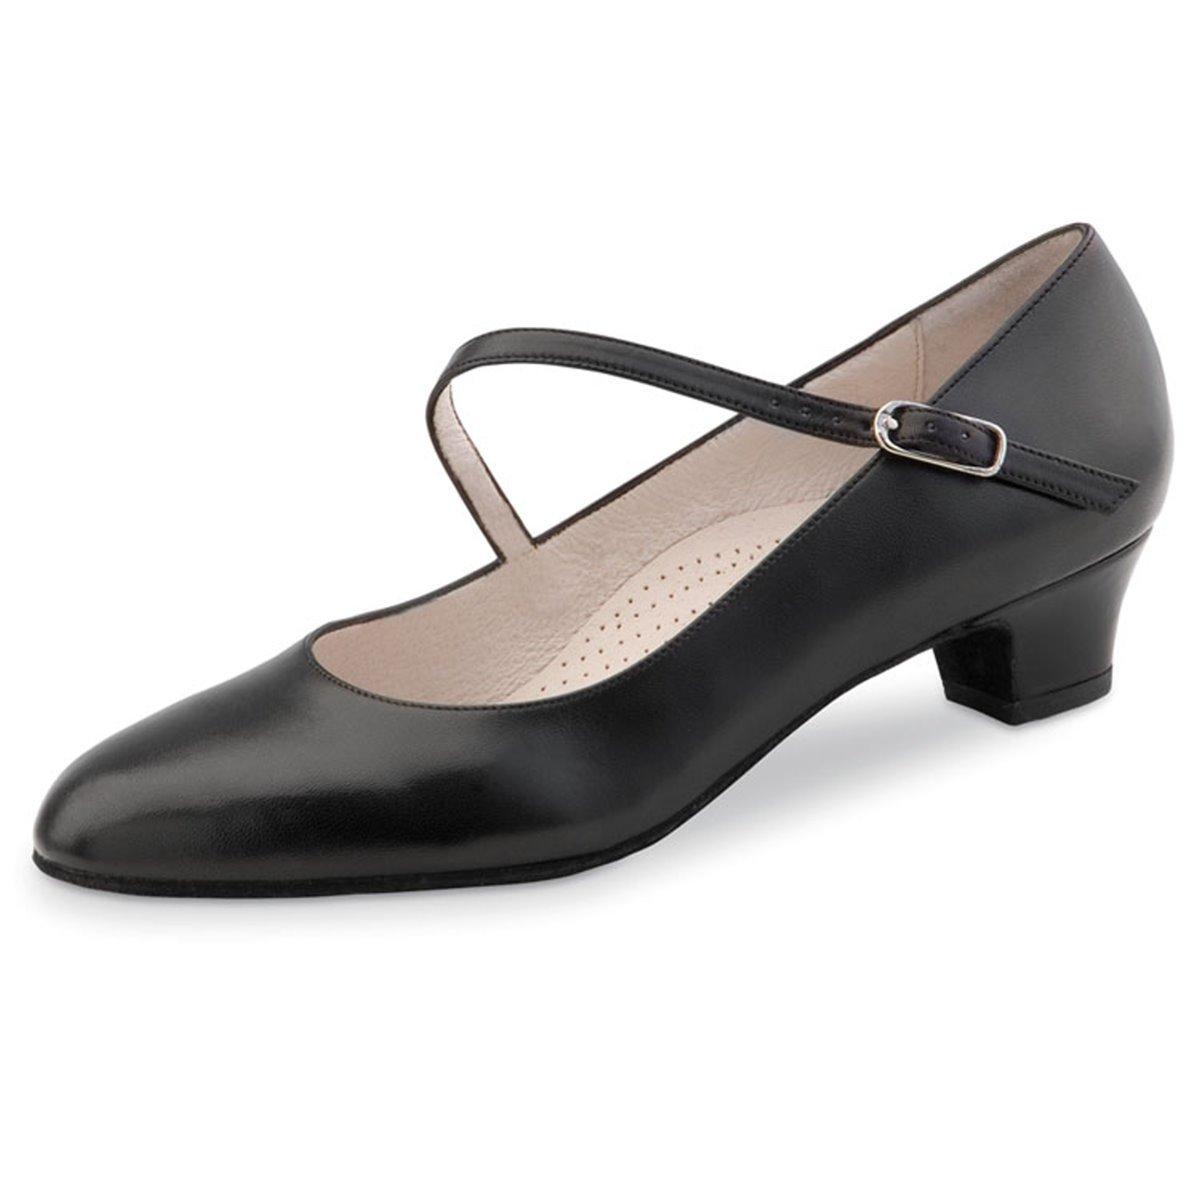 Werner Kern Femmes Chaussures de Danse Cindy - Cuir Noir - 3.4 cm